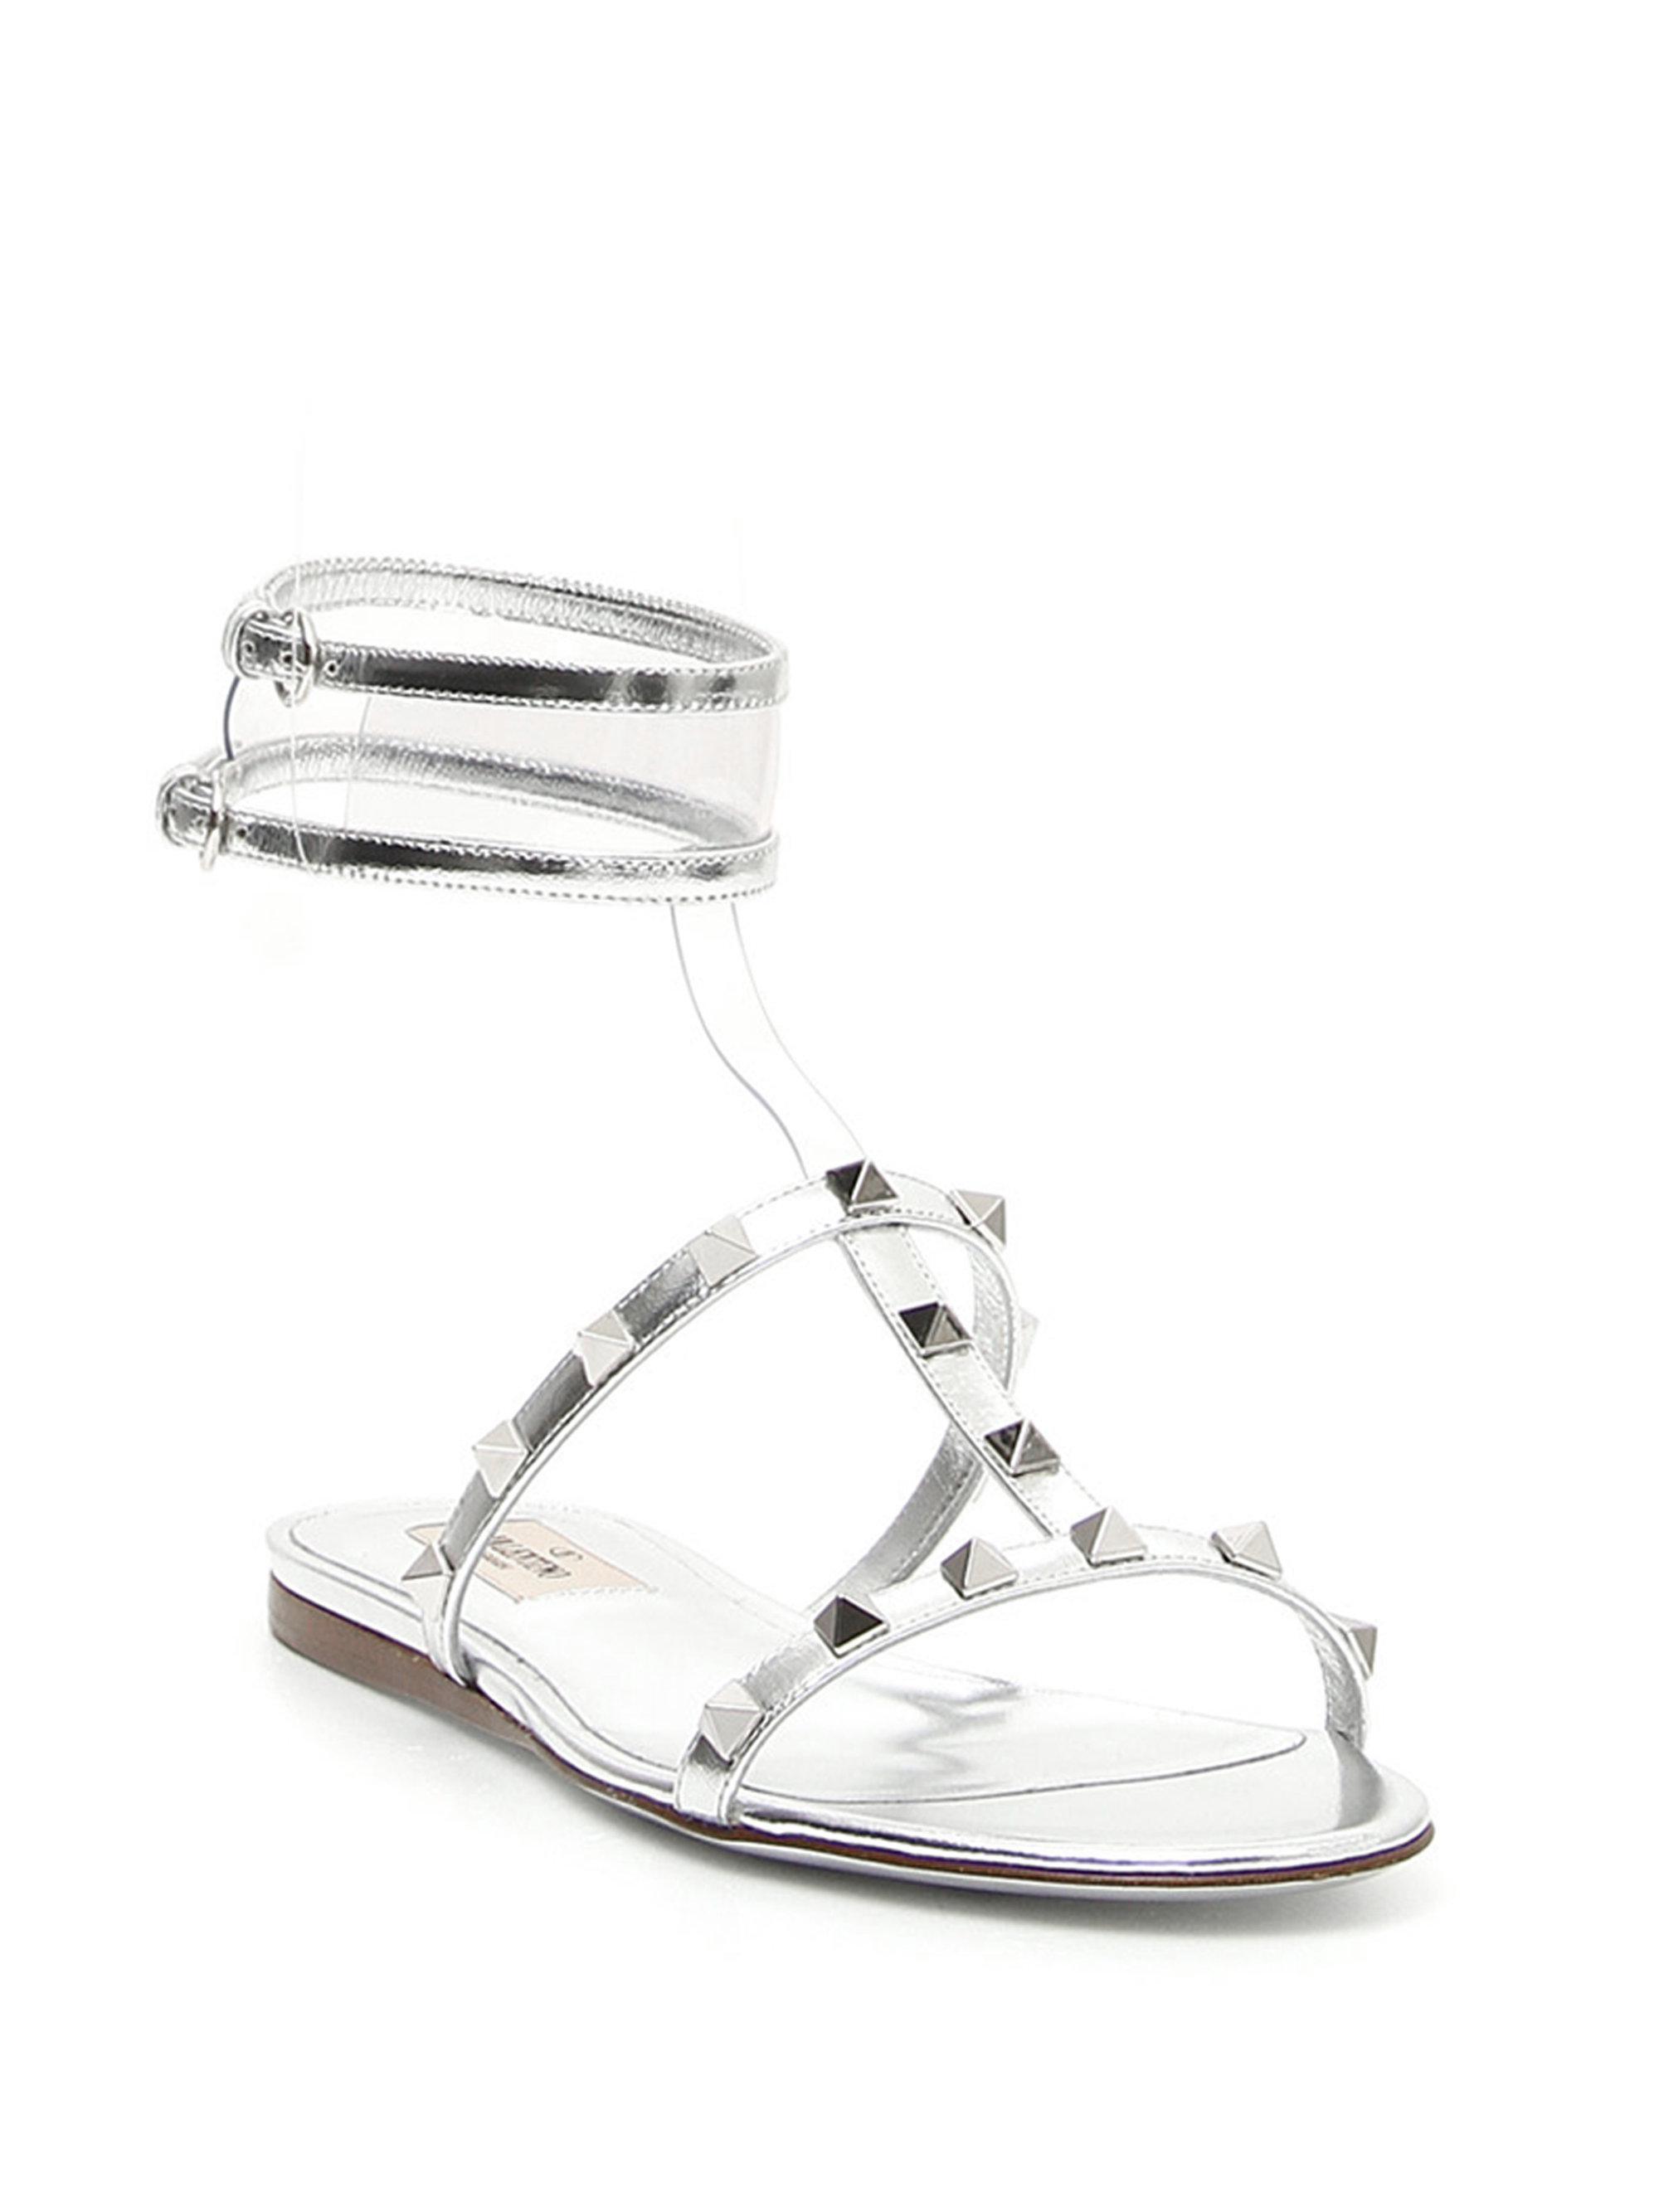 1bc9d74c5db9 Lyst - Valentino Moonwalk Gladiator Sandals in Metallic